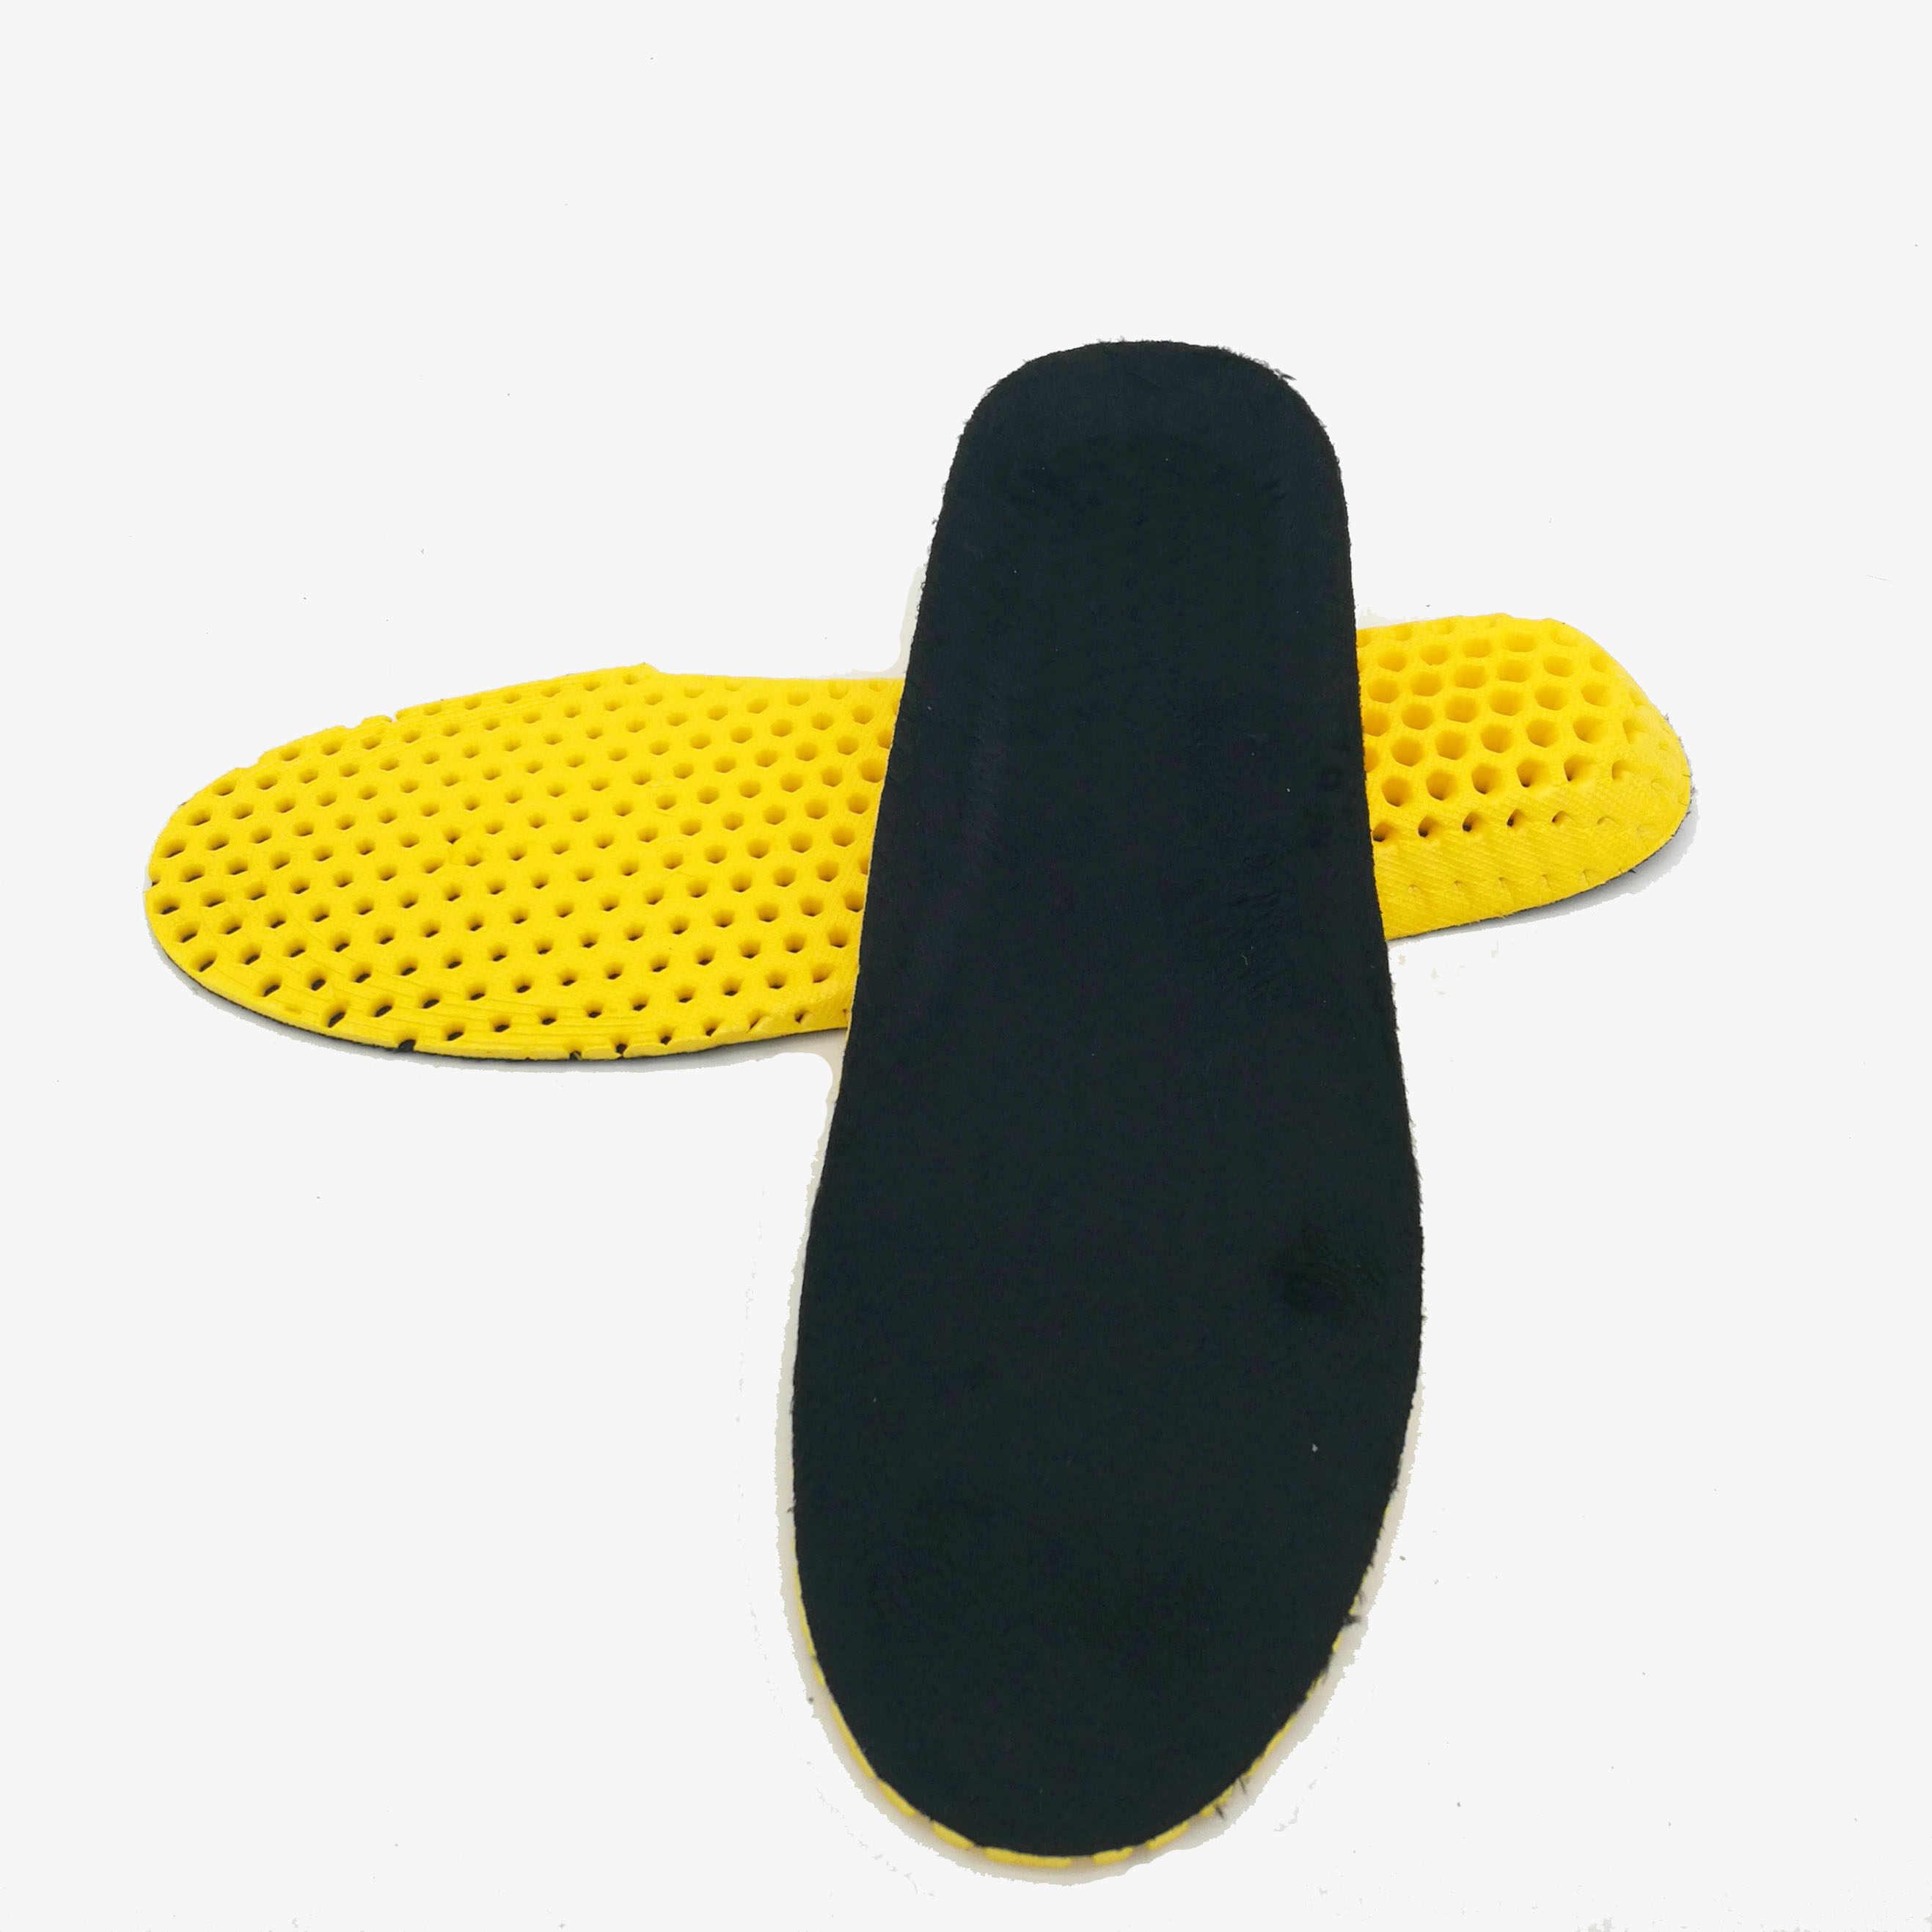 2018 Unisex ฤดูหนาวรองเท้า Pads shock absorption Insoles pads ขนสัตว์ breathable insole pad วิ่งกีฬา foot care